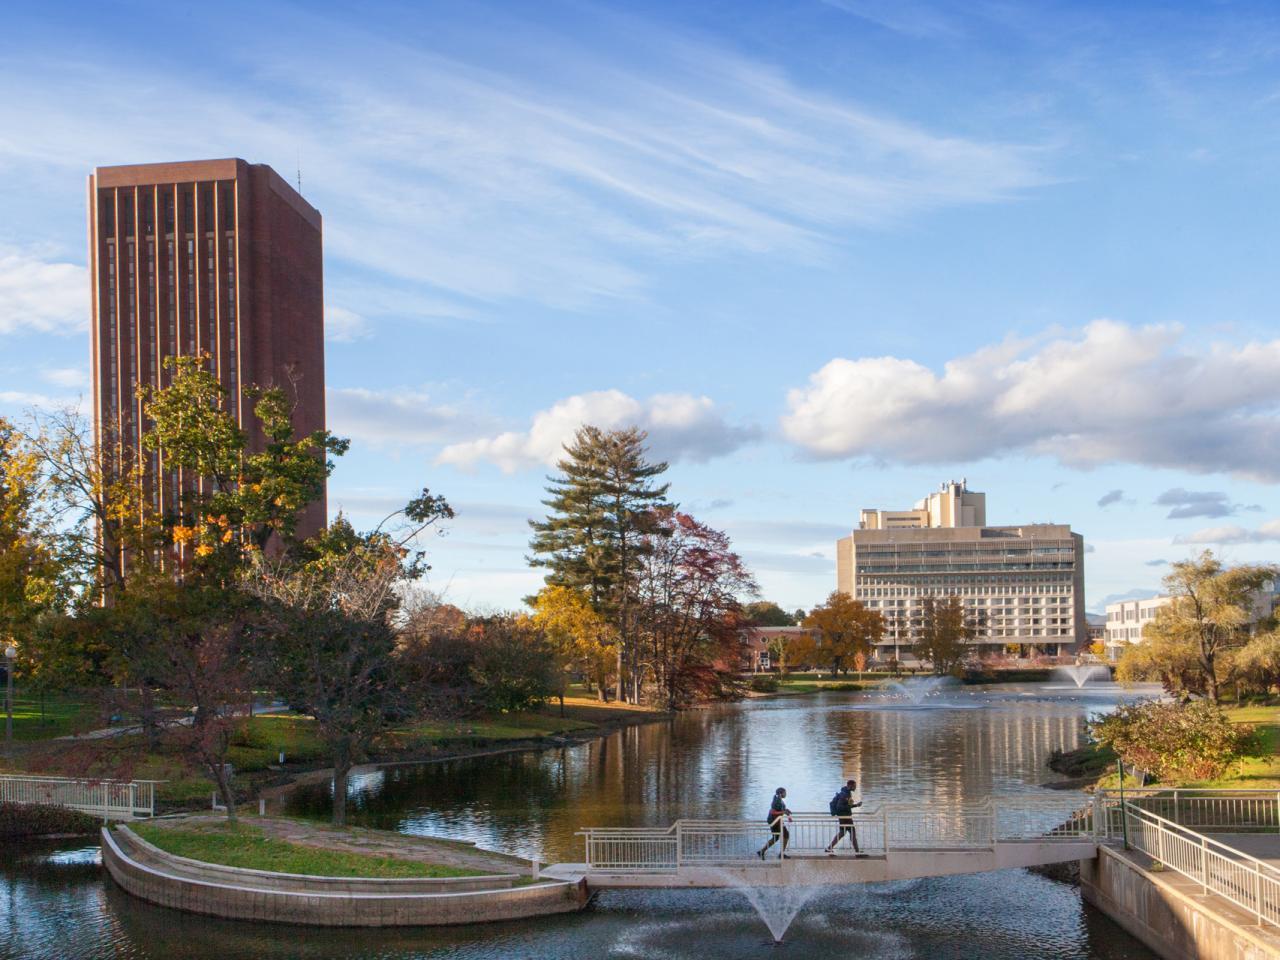 University of Massachusetts in Amherst, Massachusetts